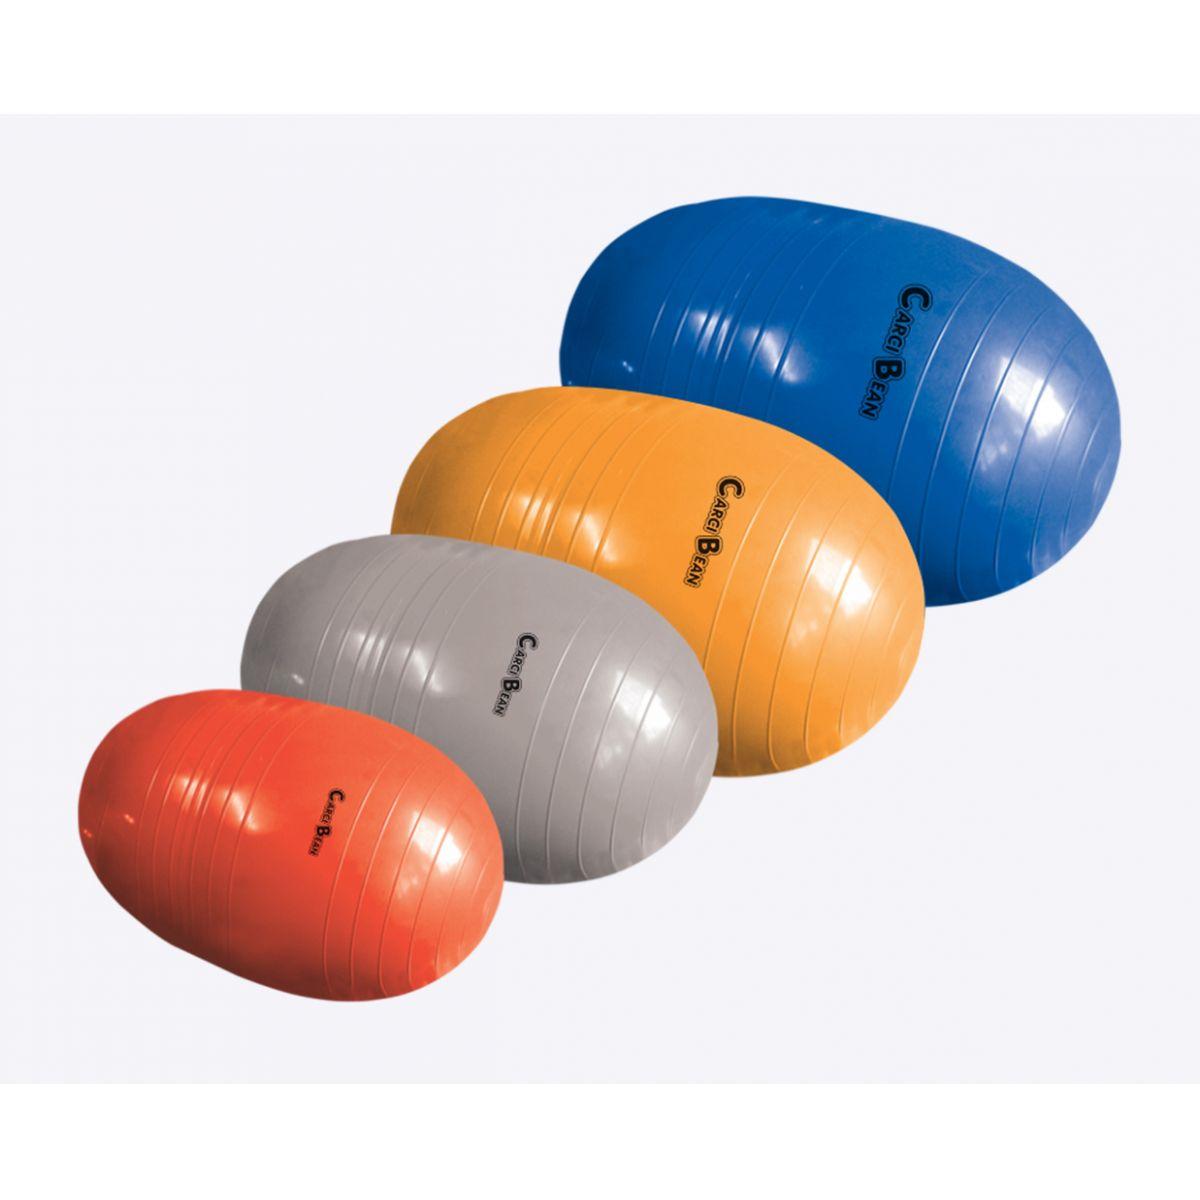 Bola feijão para pilates Carci Bean 30cm- RL.02.30